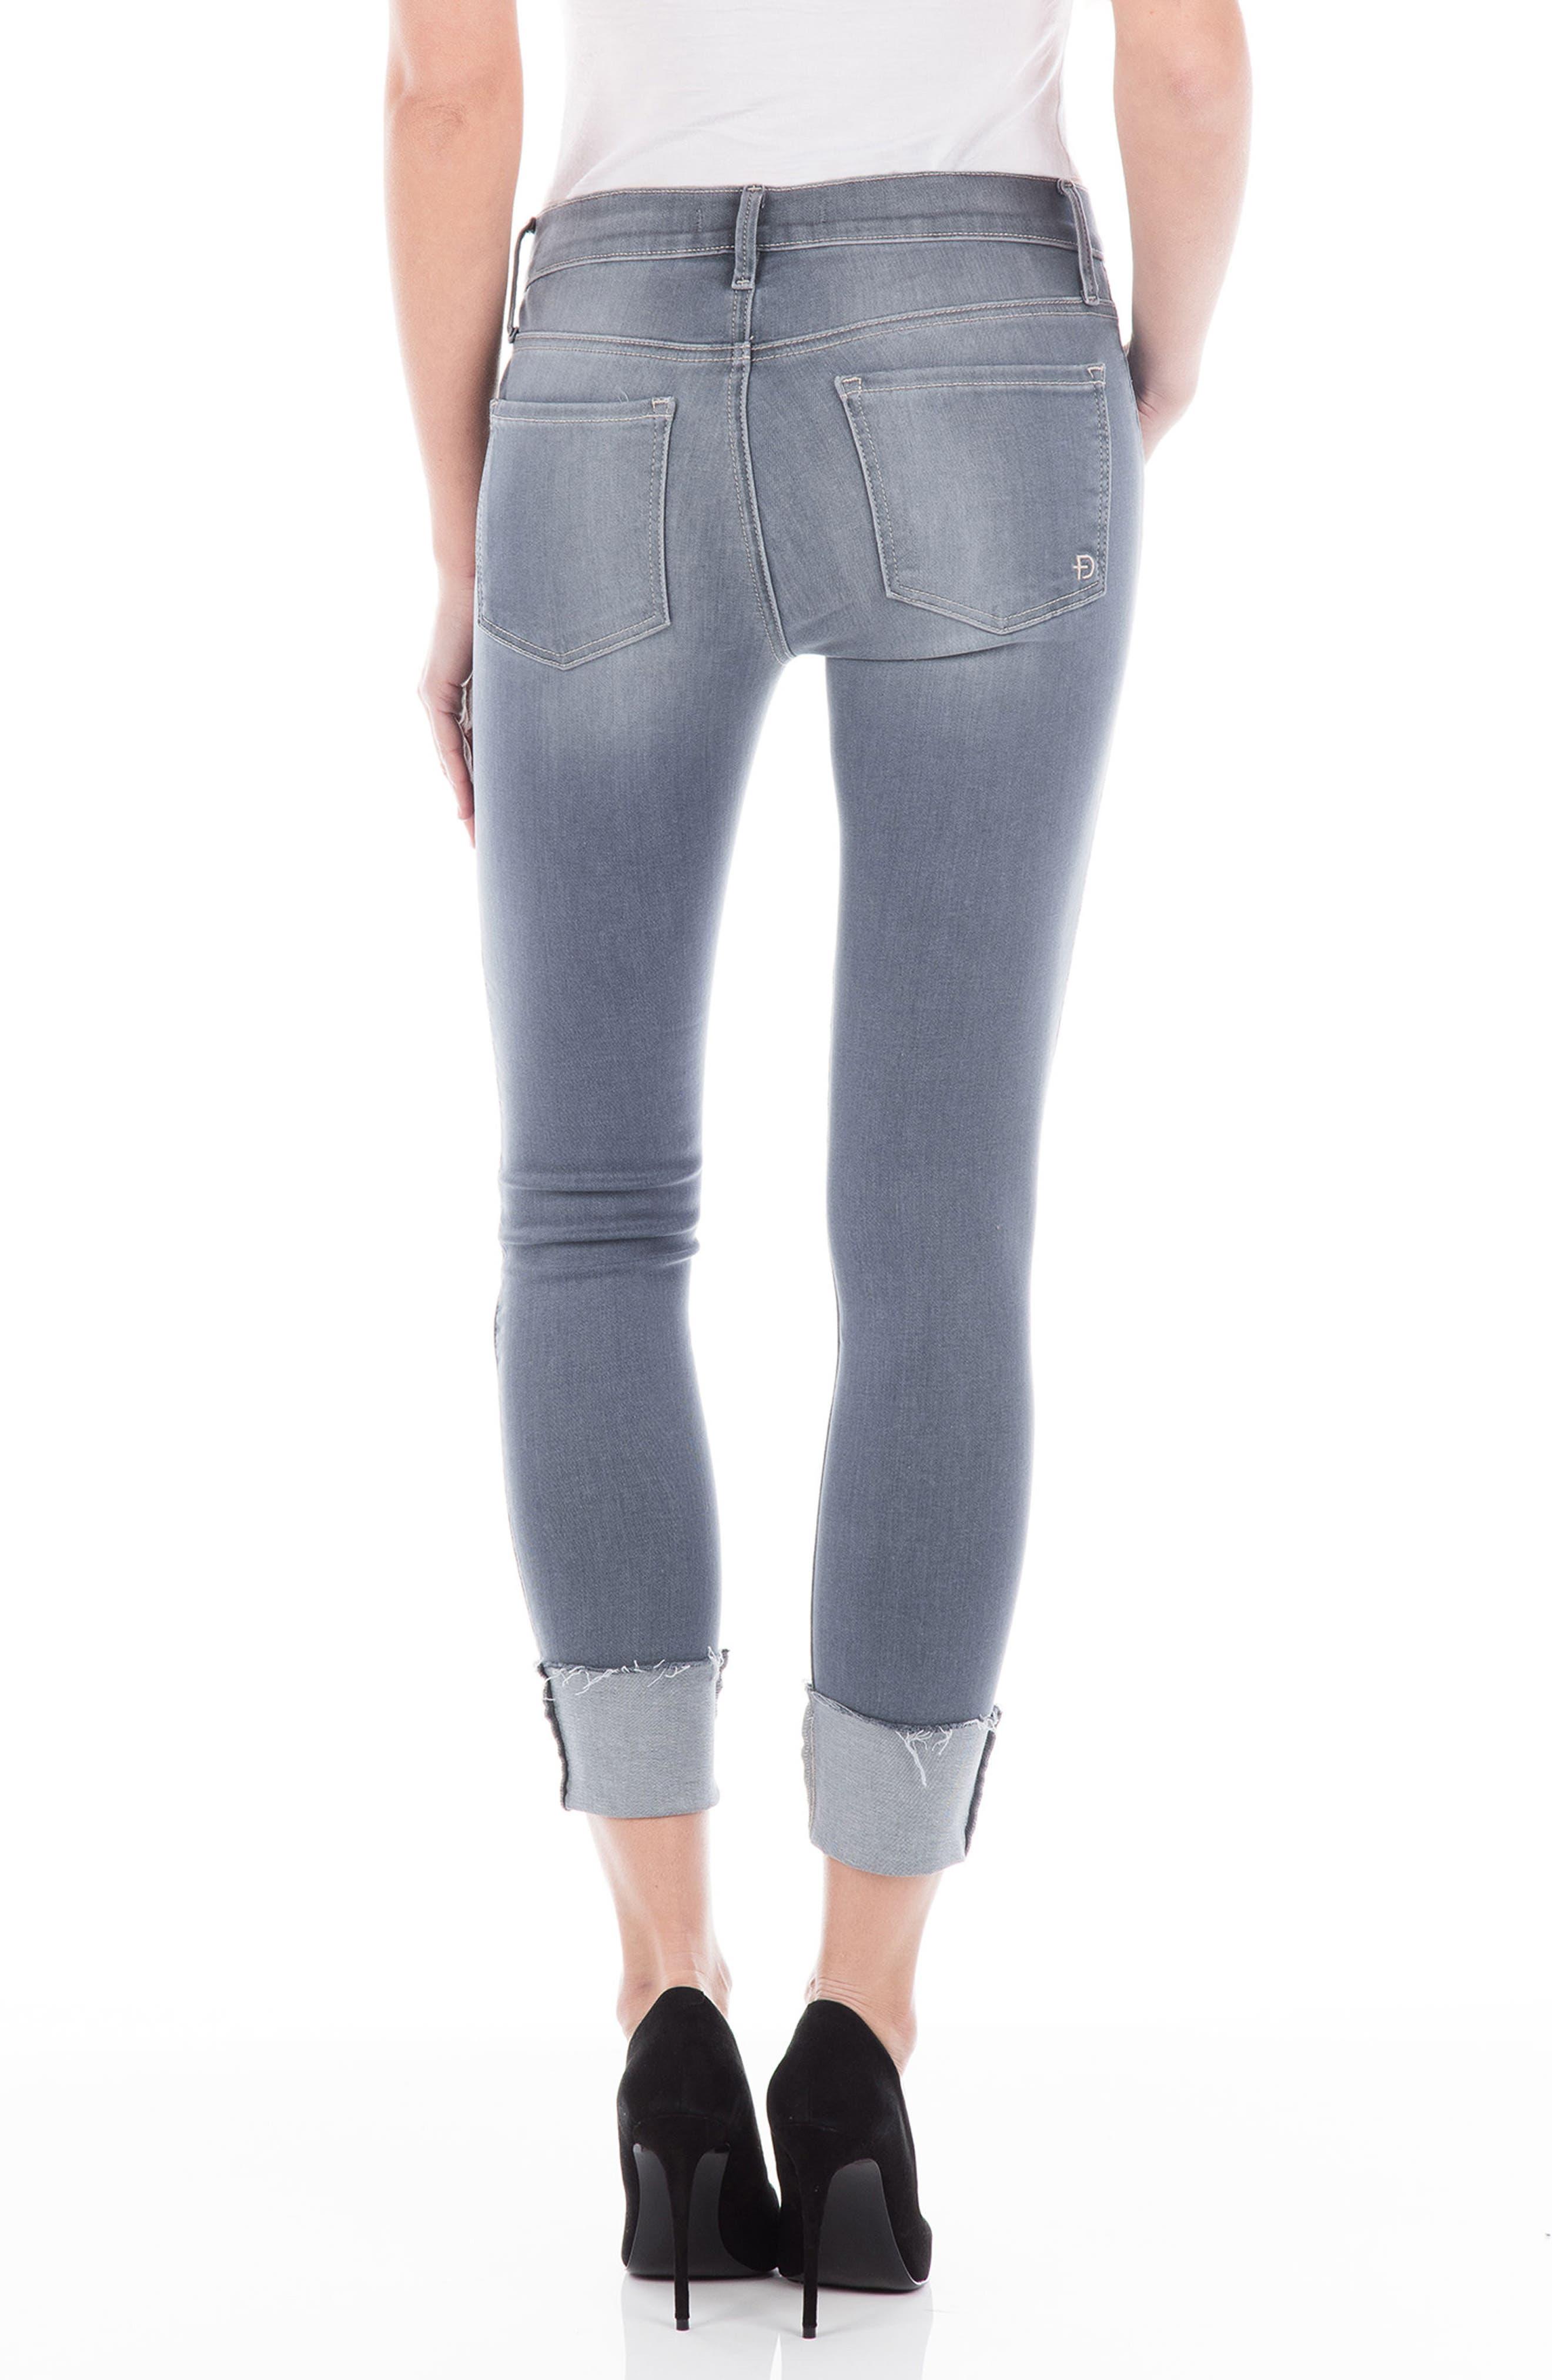 Belvedere Crop Skinny Jeans,                             Alternate thumbnail 2, color,                             020